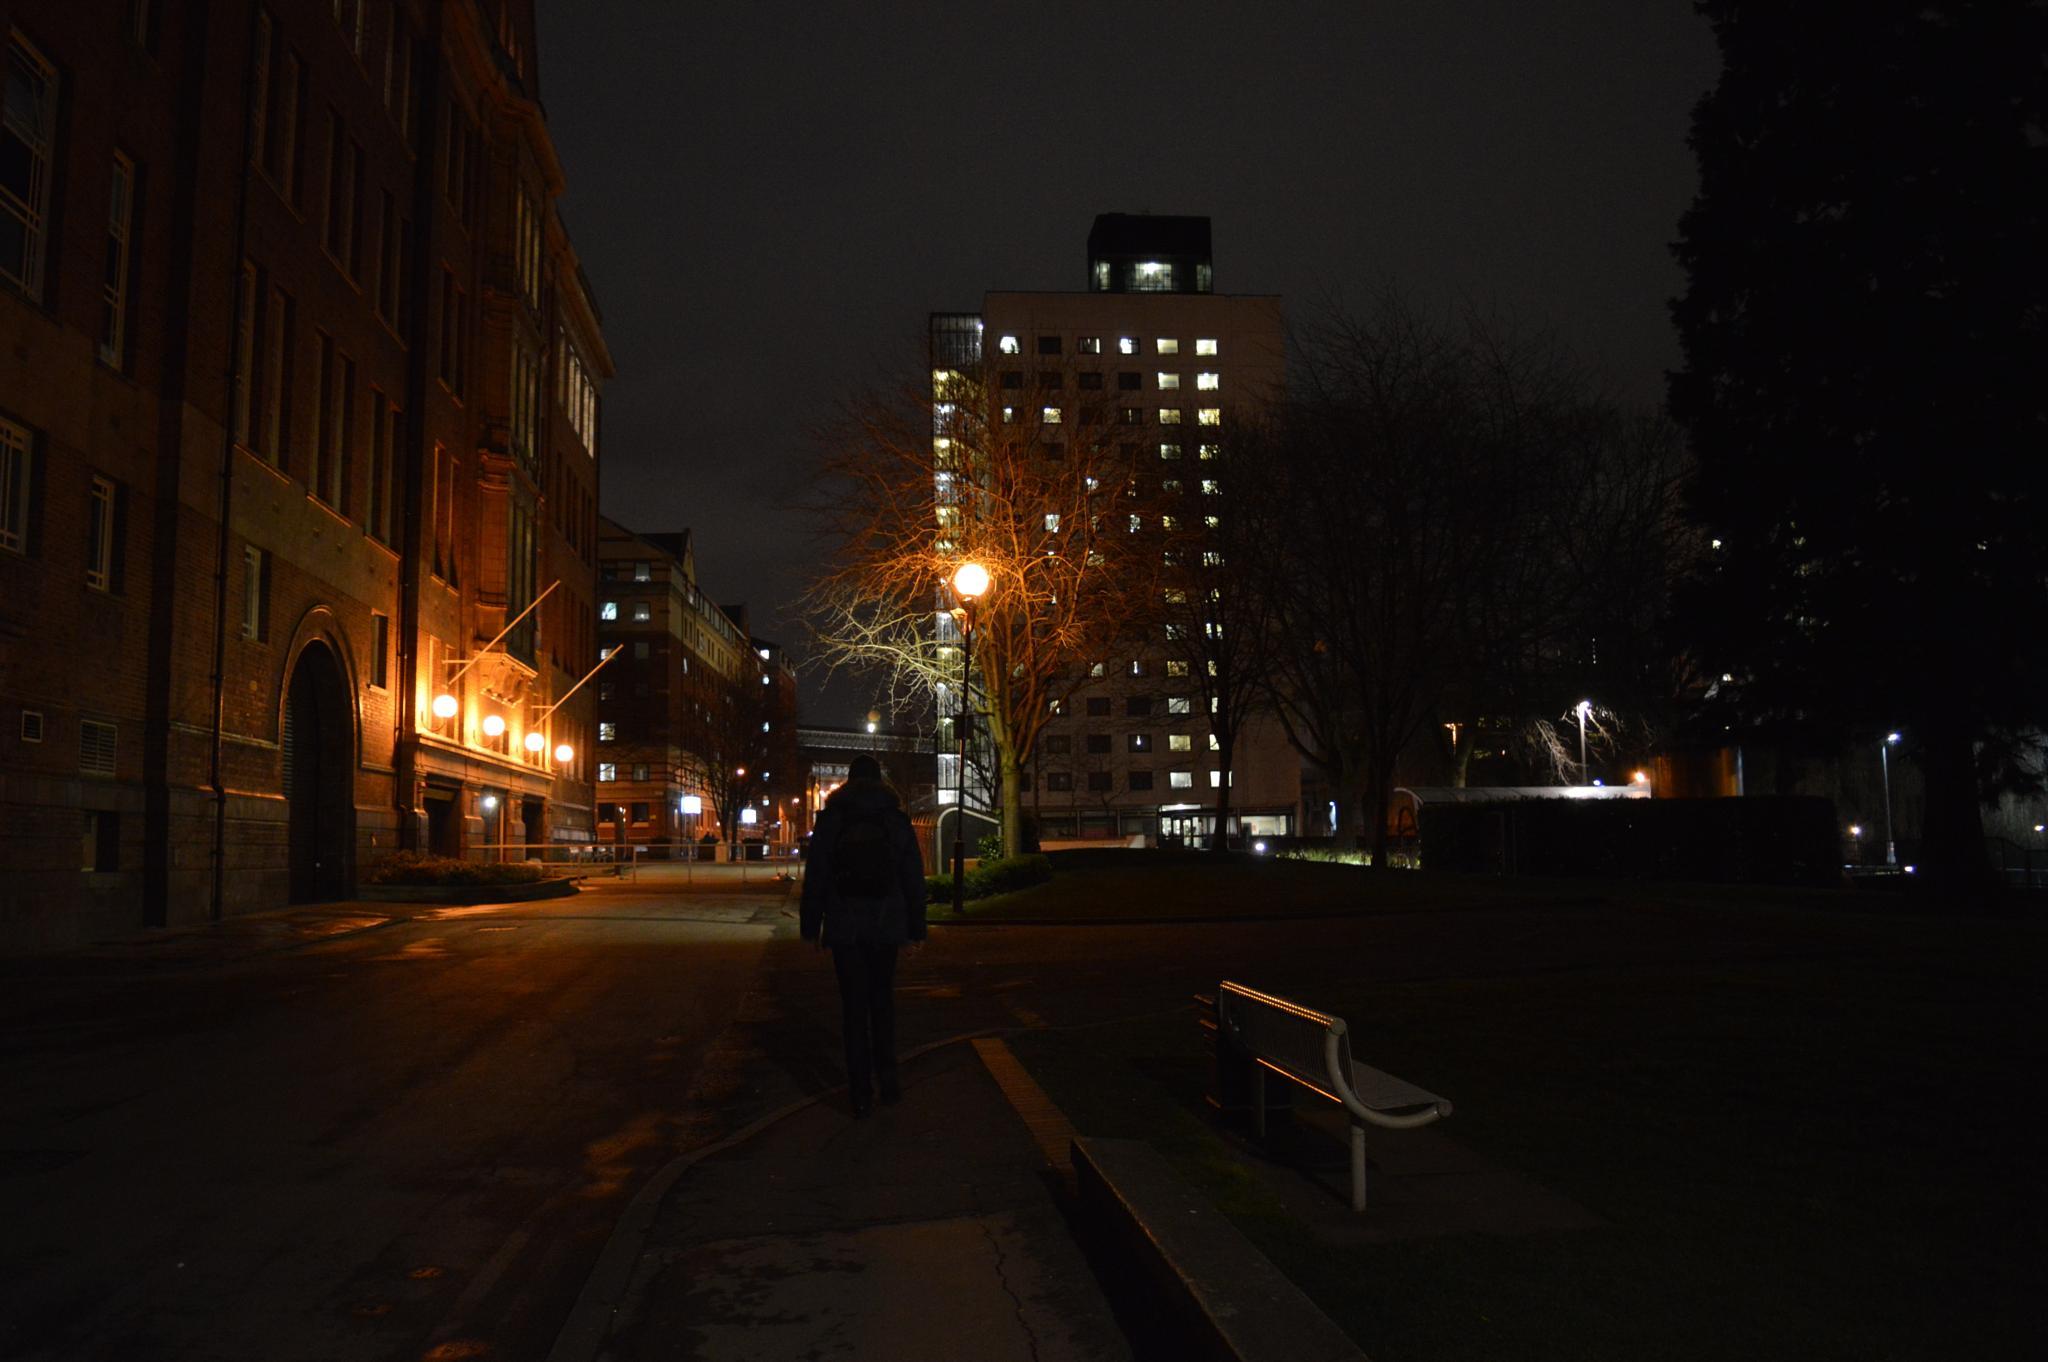 Lone Silhouette in The Dark  by leon.j.fox